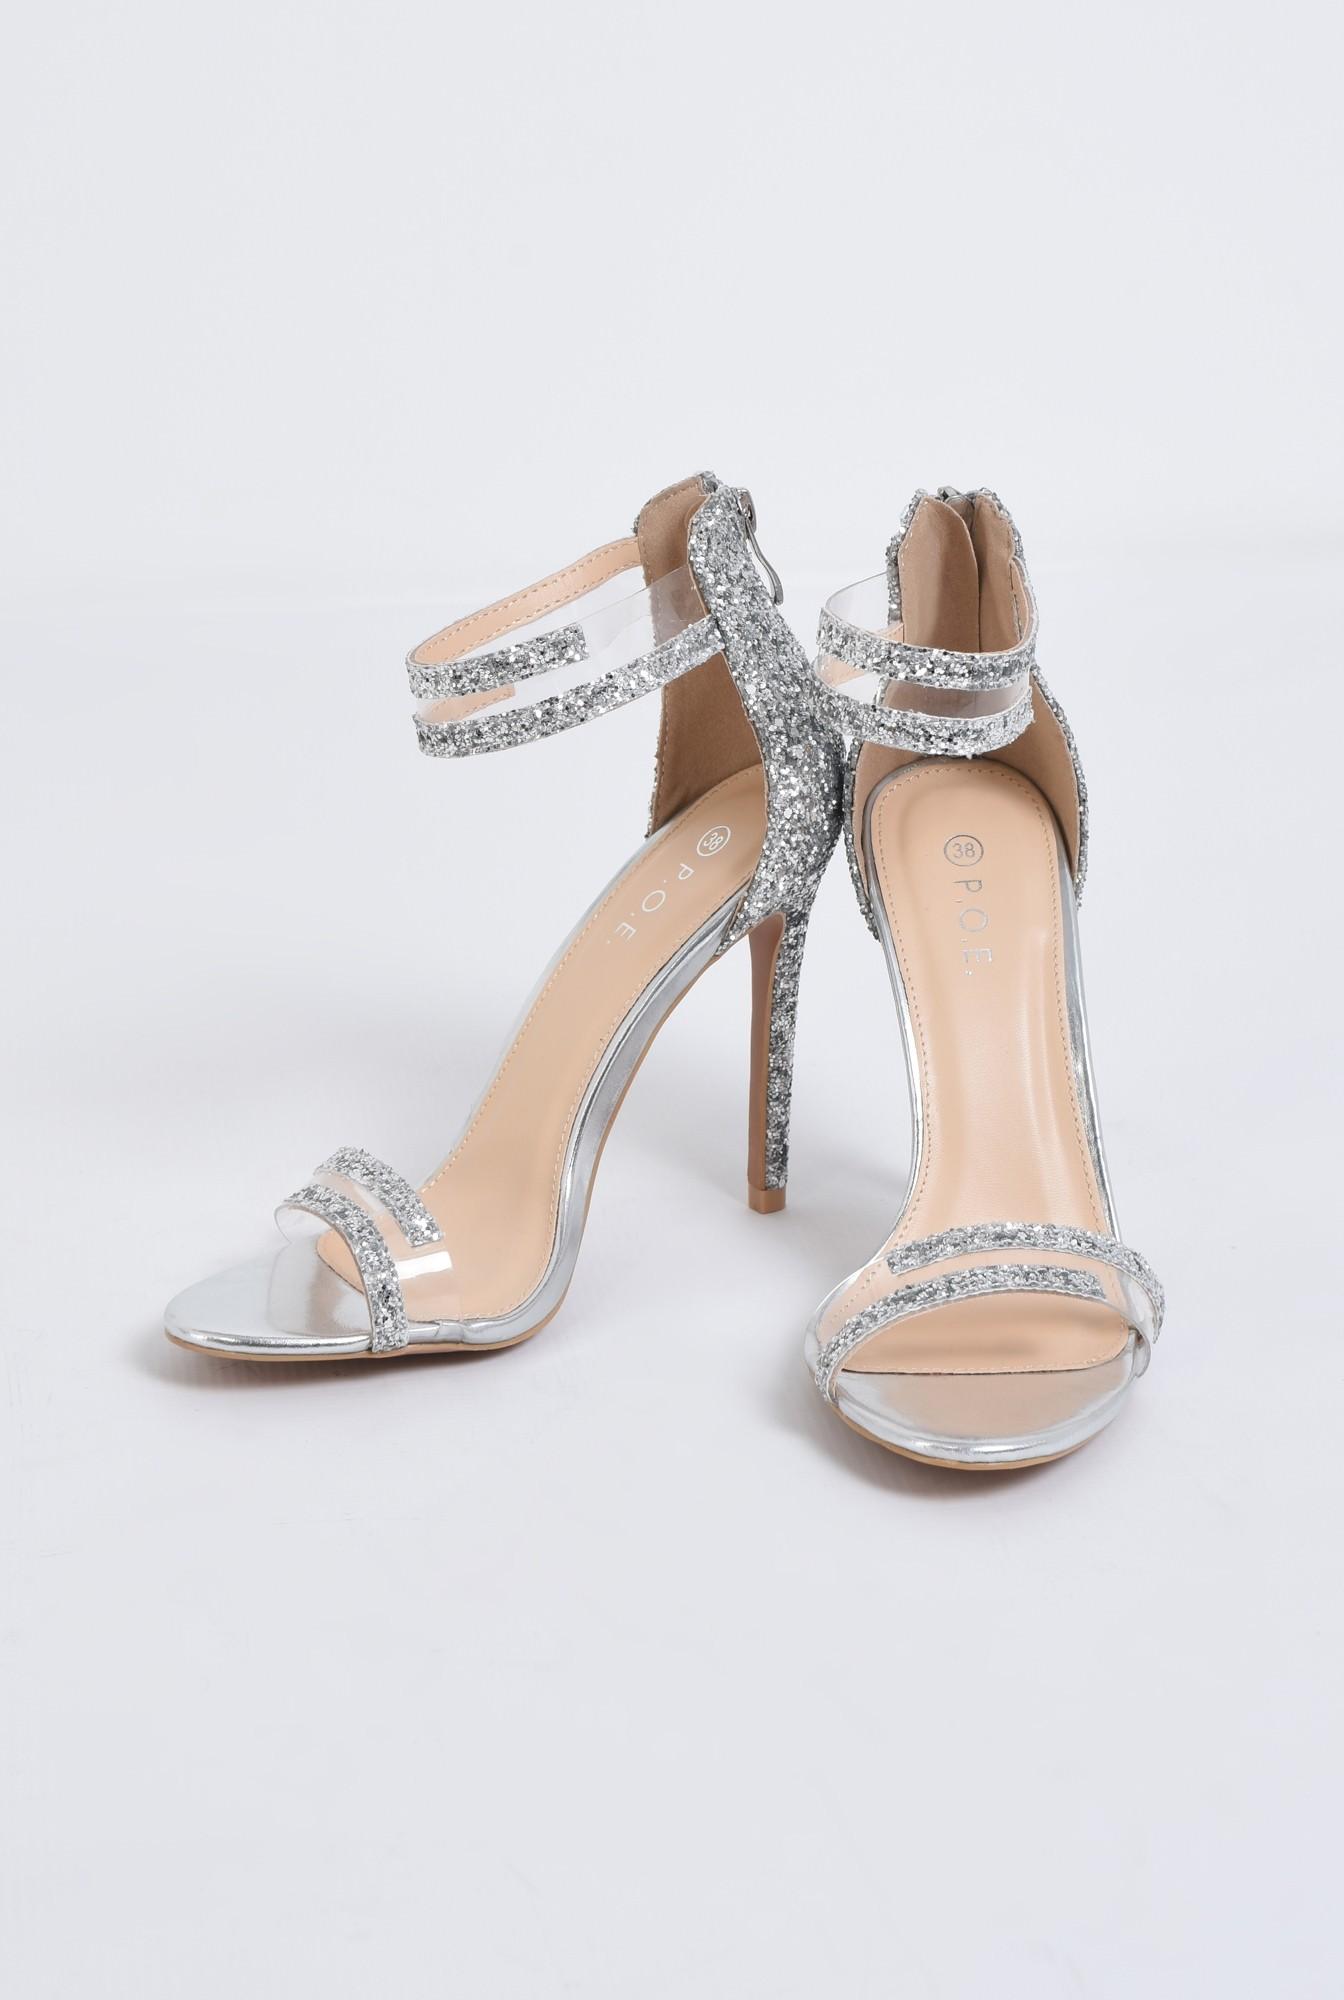 2 - sandale elegante, argintii, cu glitter, stiletto